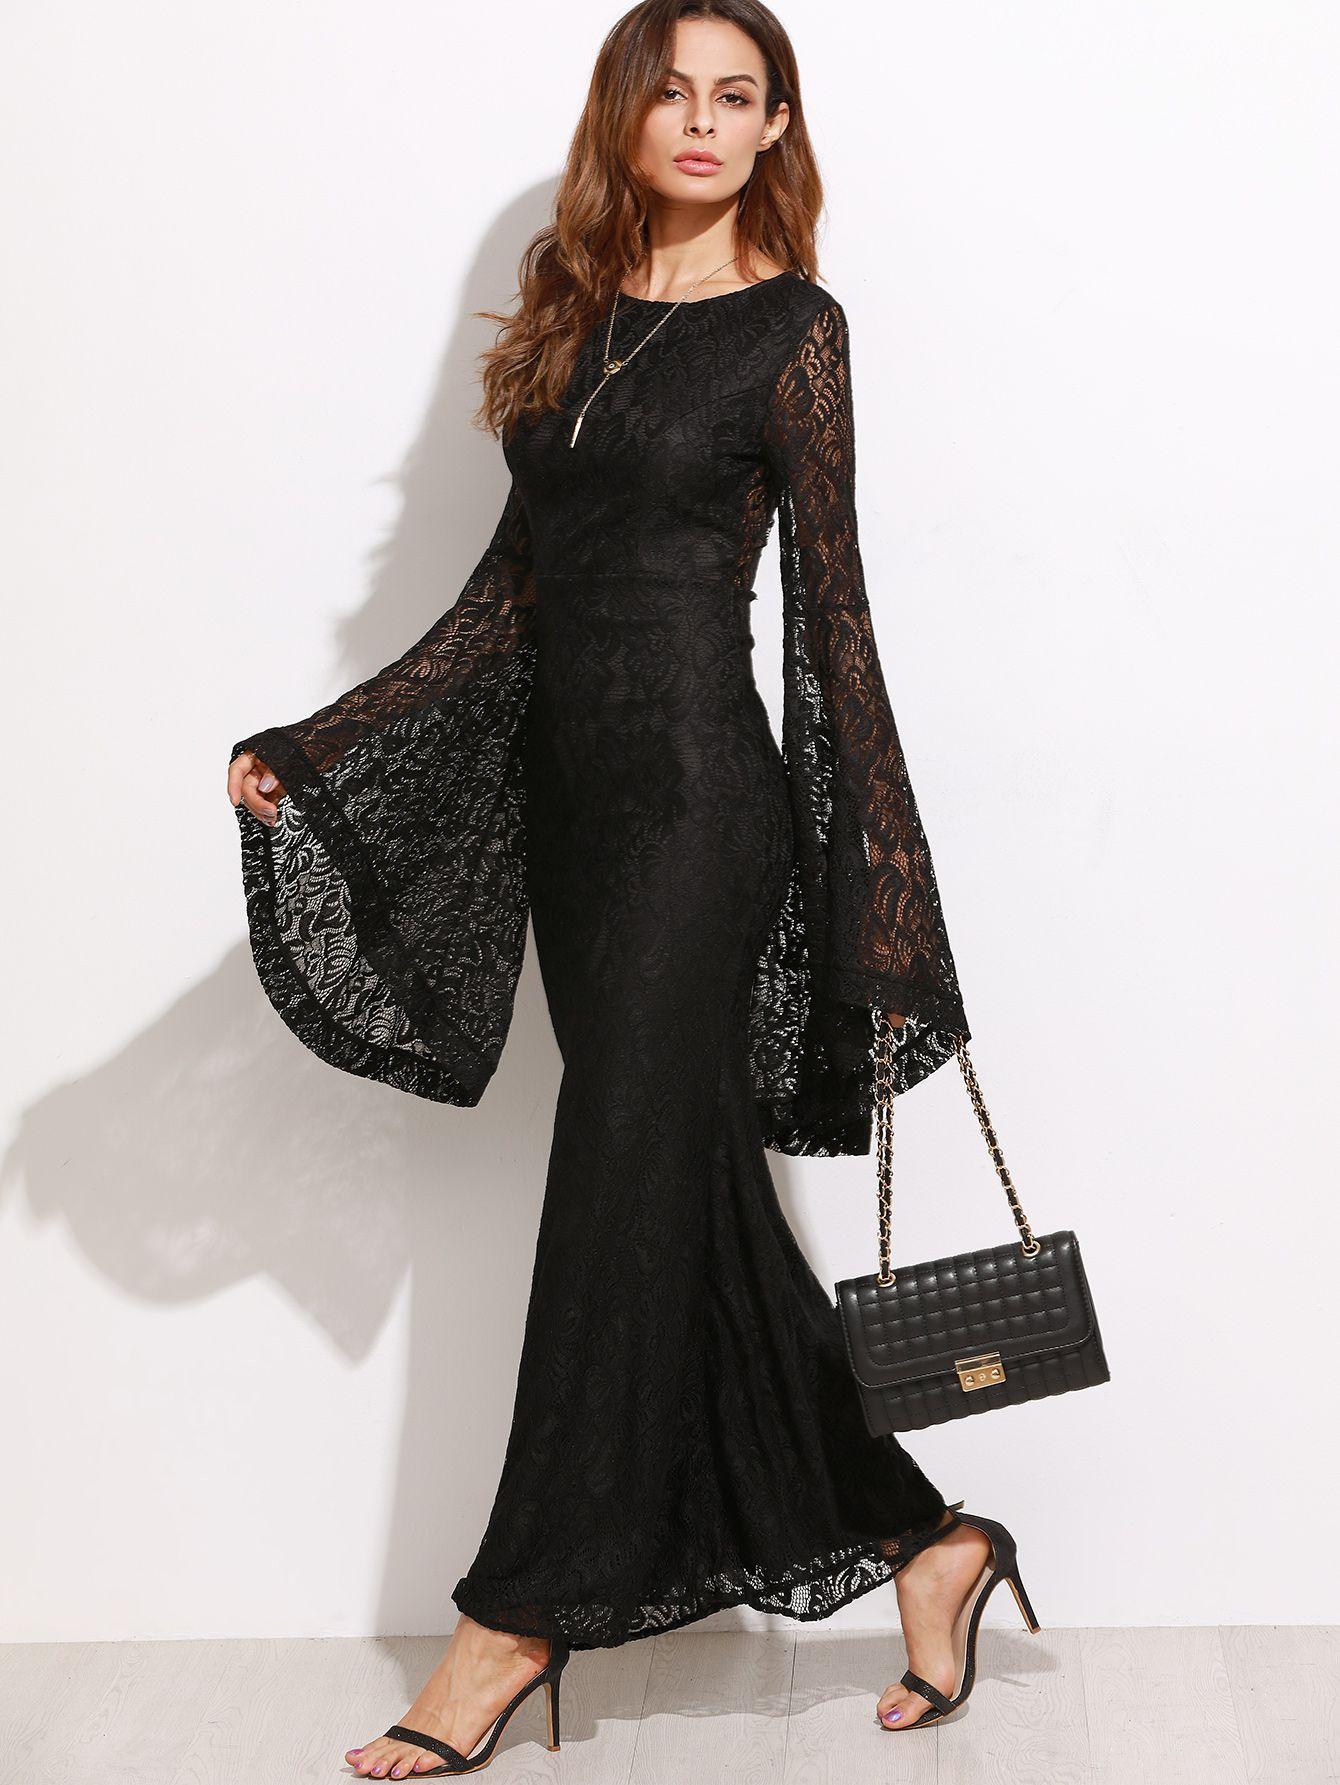 Pin By Vivi V On Hijab Abayas Fashion Lace Dress Long Black Maxi Dress Floral Lace Maxi Dress